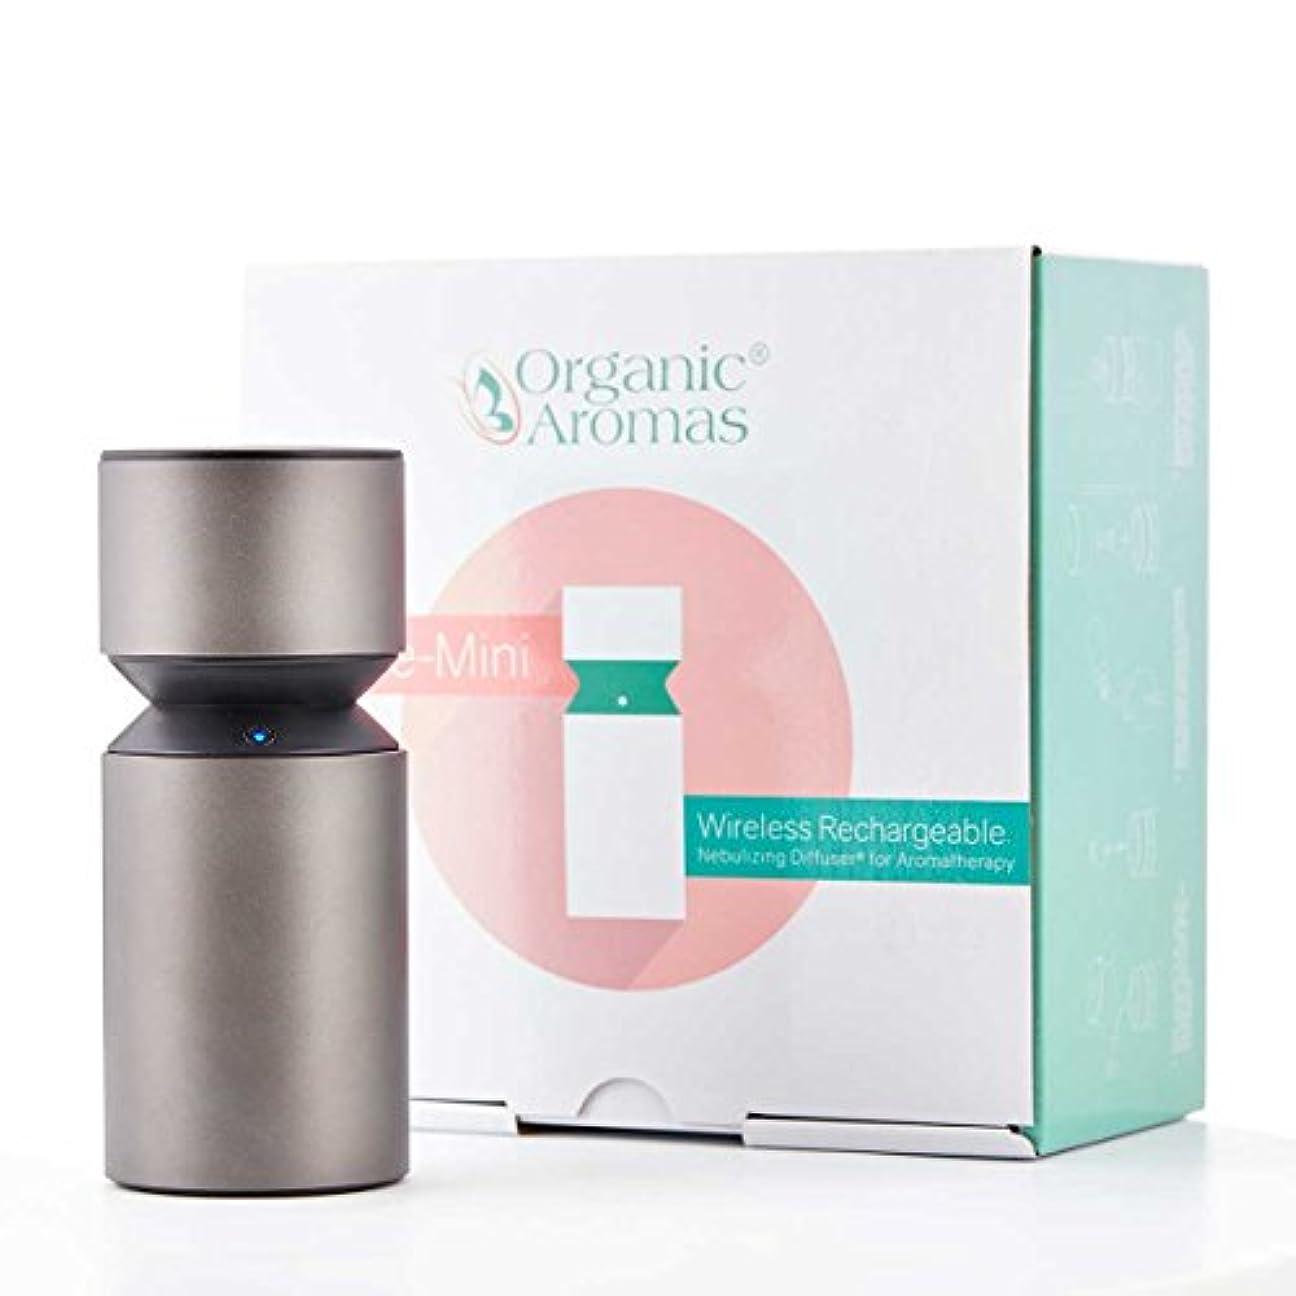 Organic Aromas アロマテラピー用モバイルミニ 2.0ワイヤレス充電式噴霧ディフューザー 1